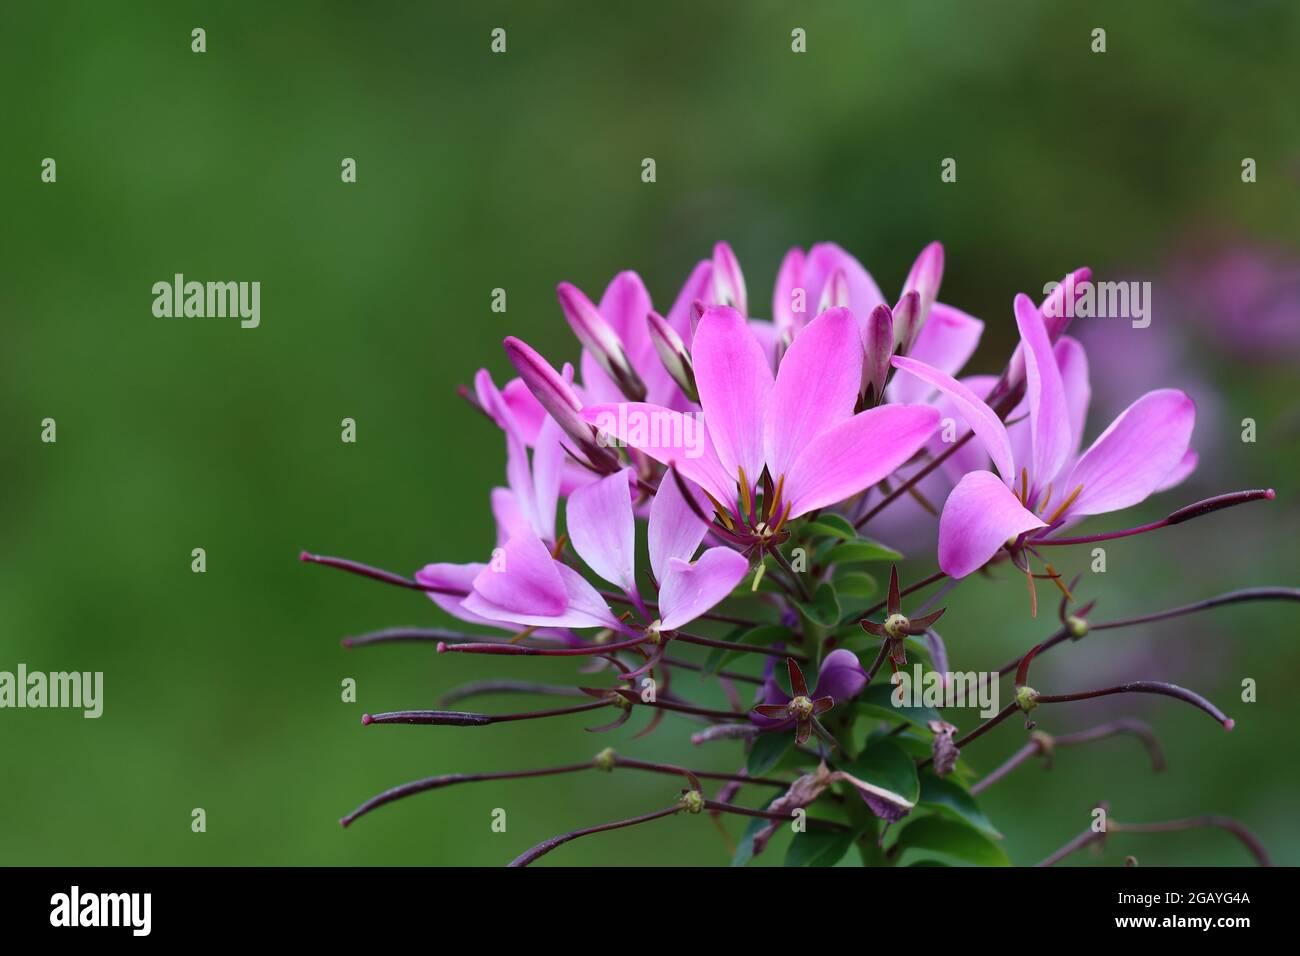 Cleome hassleriana in Nahaufnahme Stock Photo